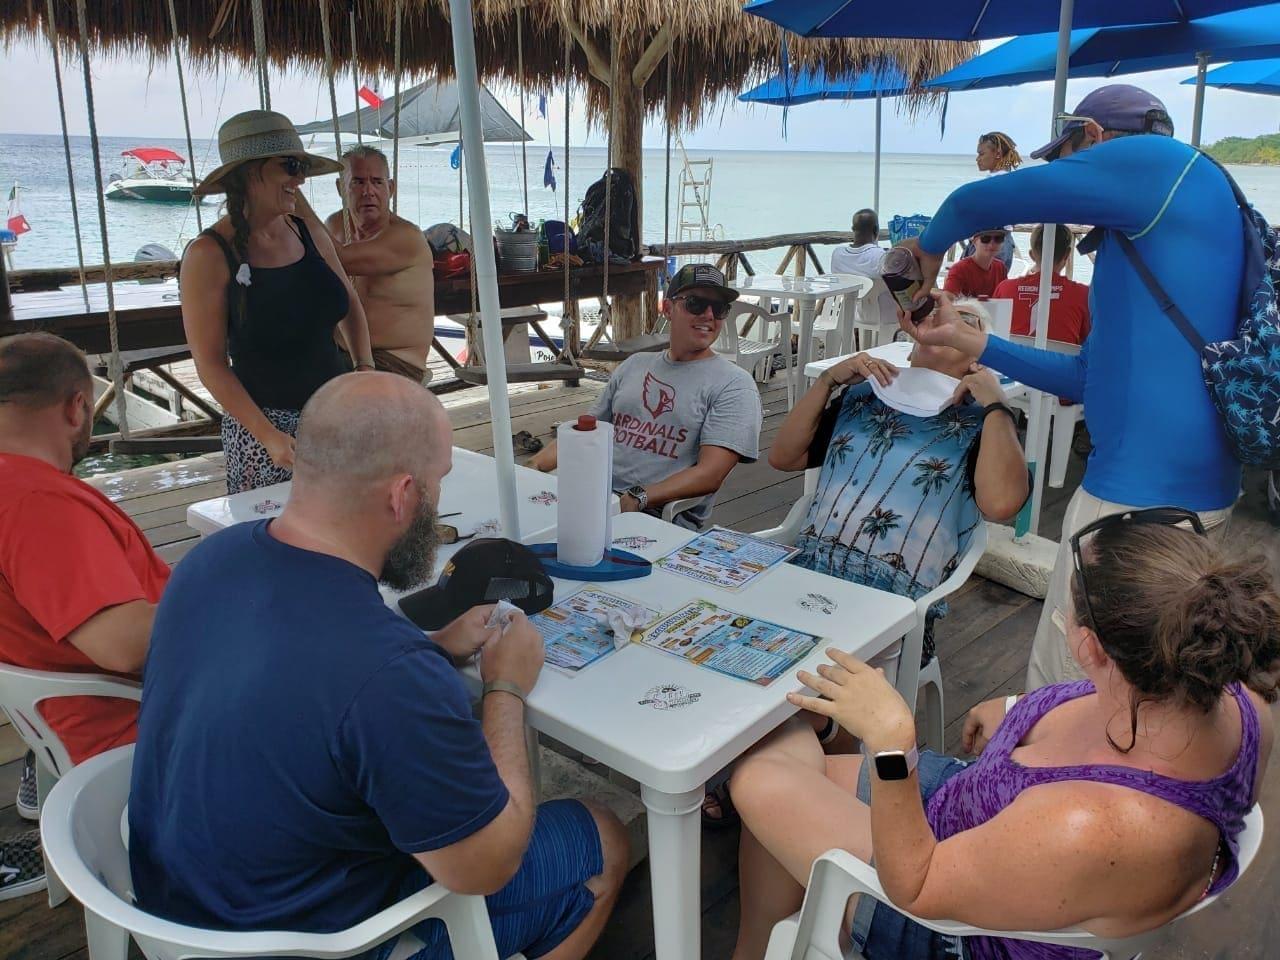 Bar Hop Cozumel island by jeep riders cozumel tours